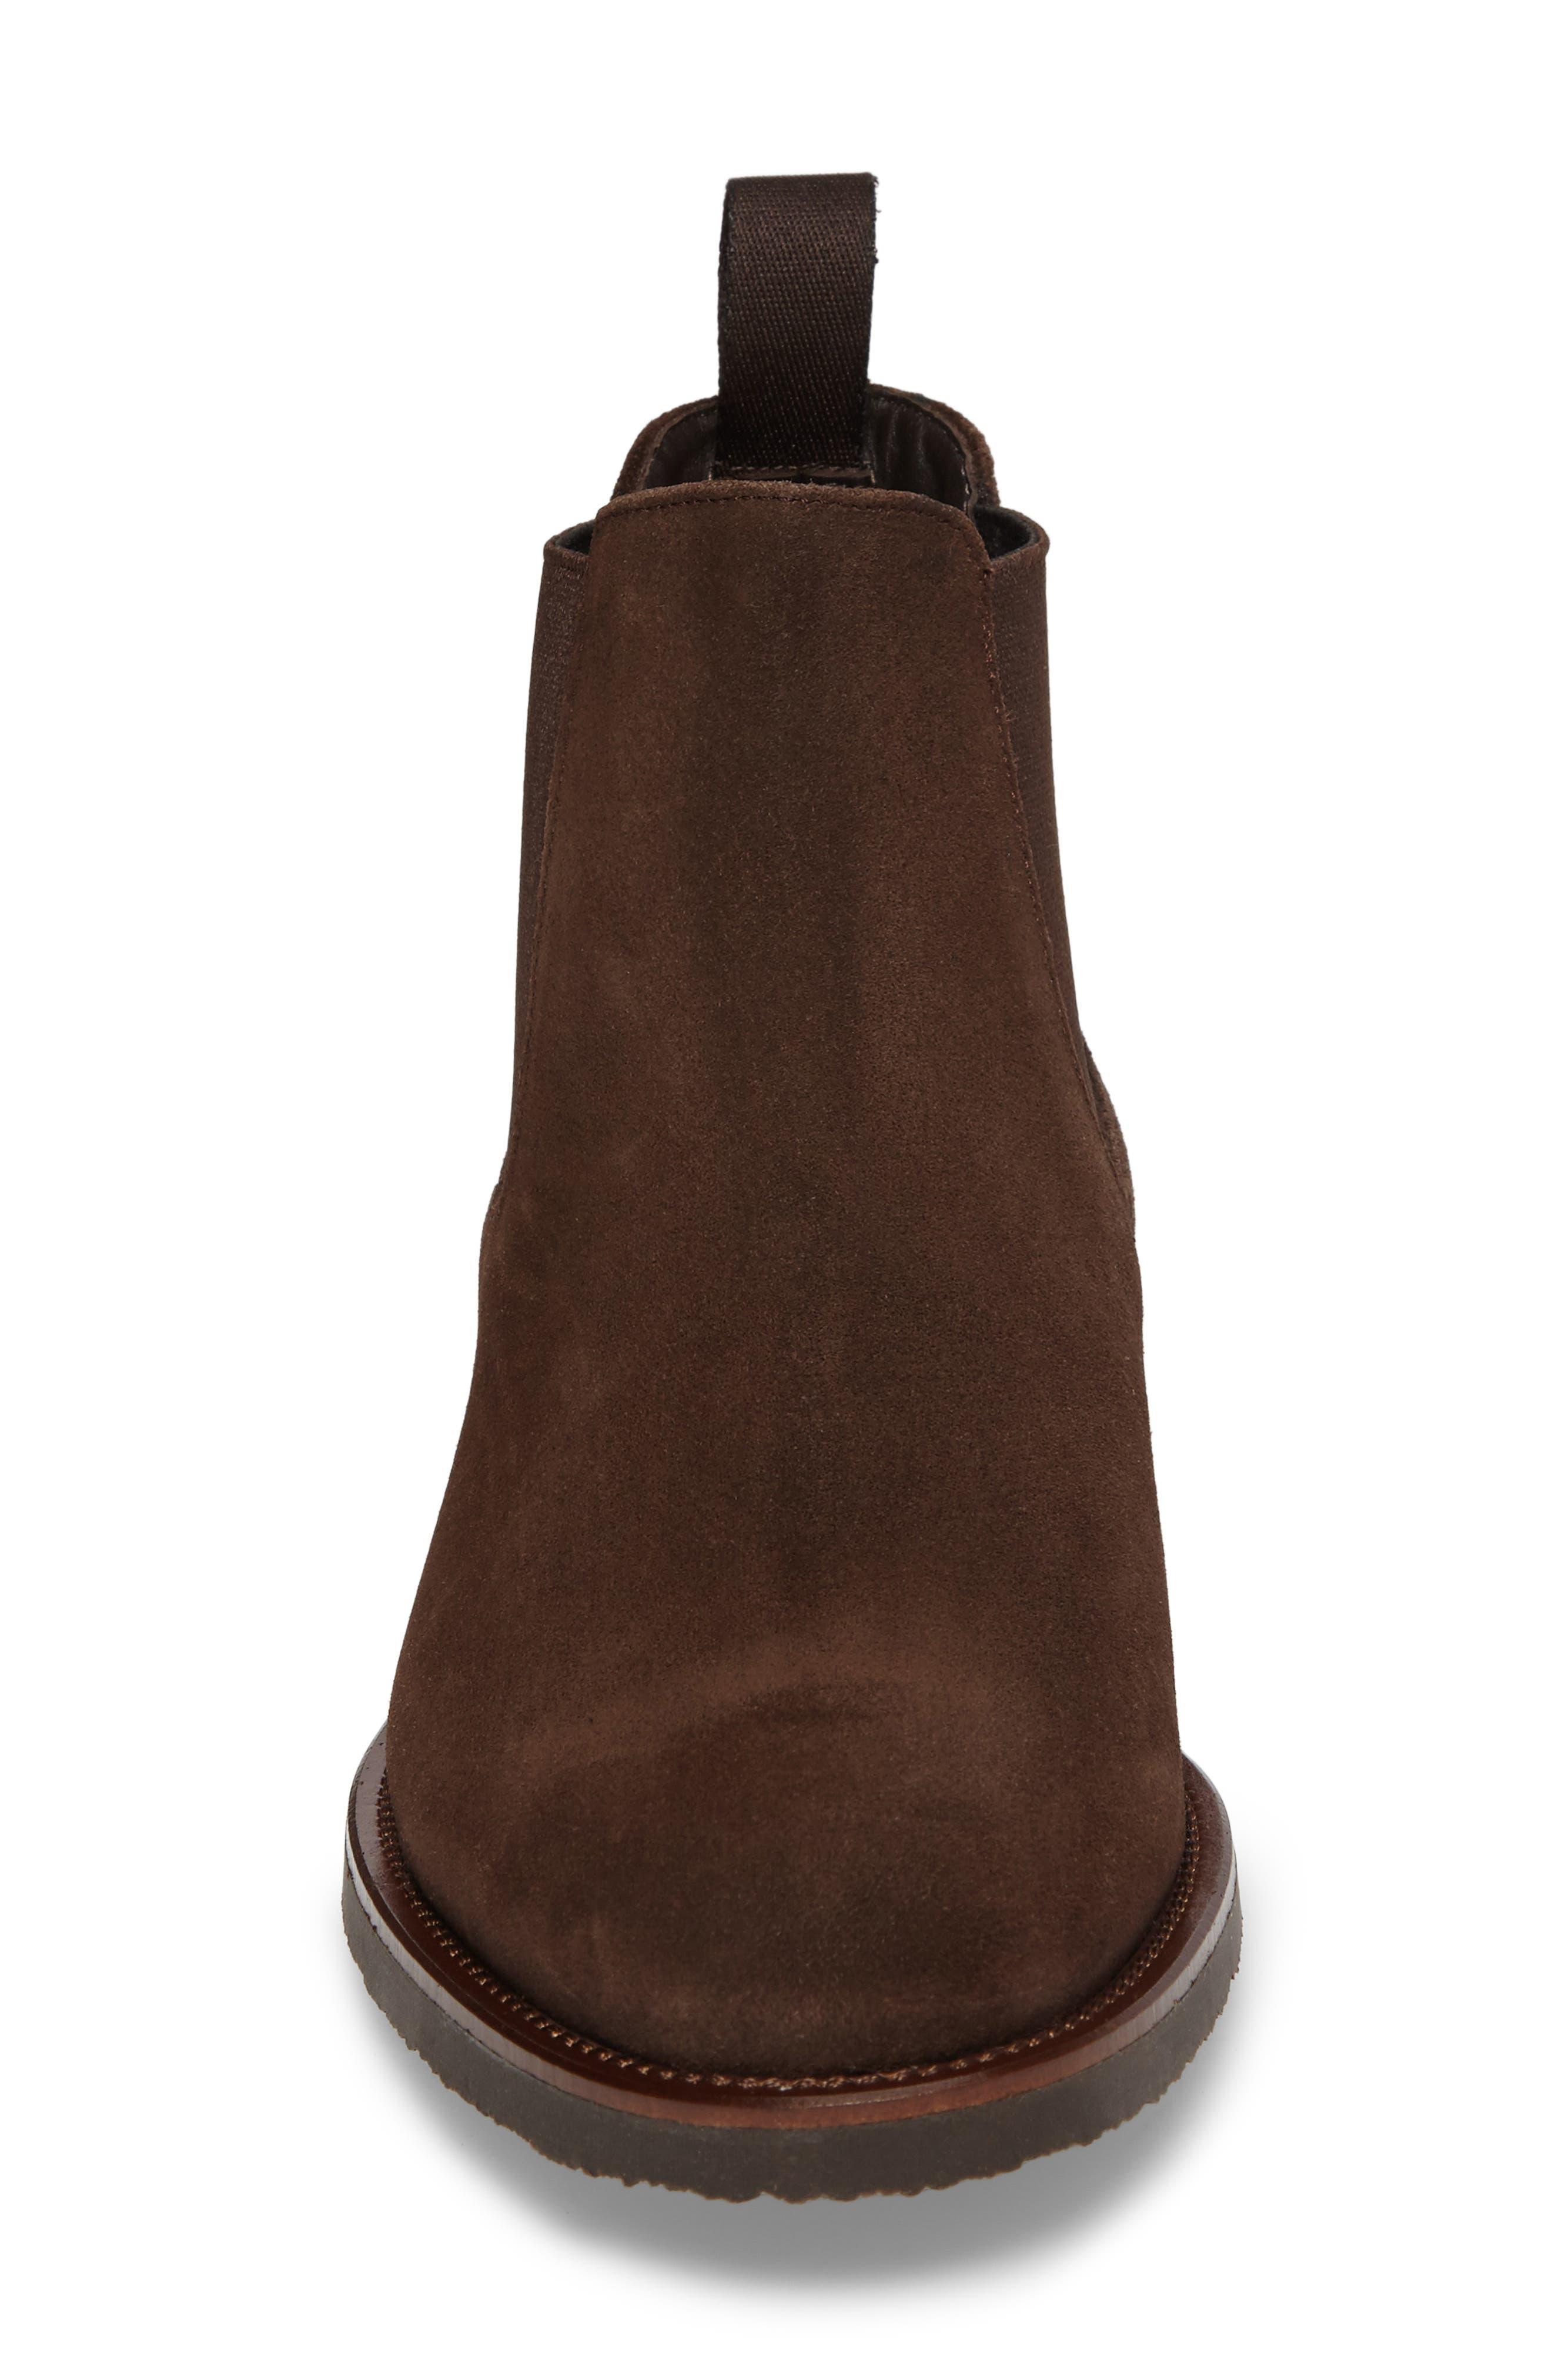 Corden Chelsea Boot,                             Alternate thumbnail 4, color,                             201